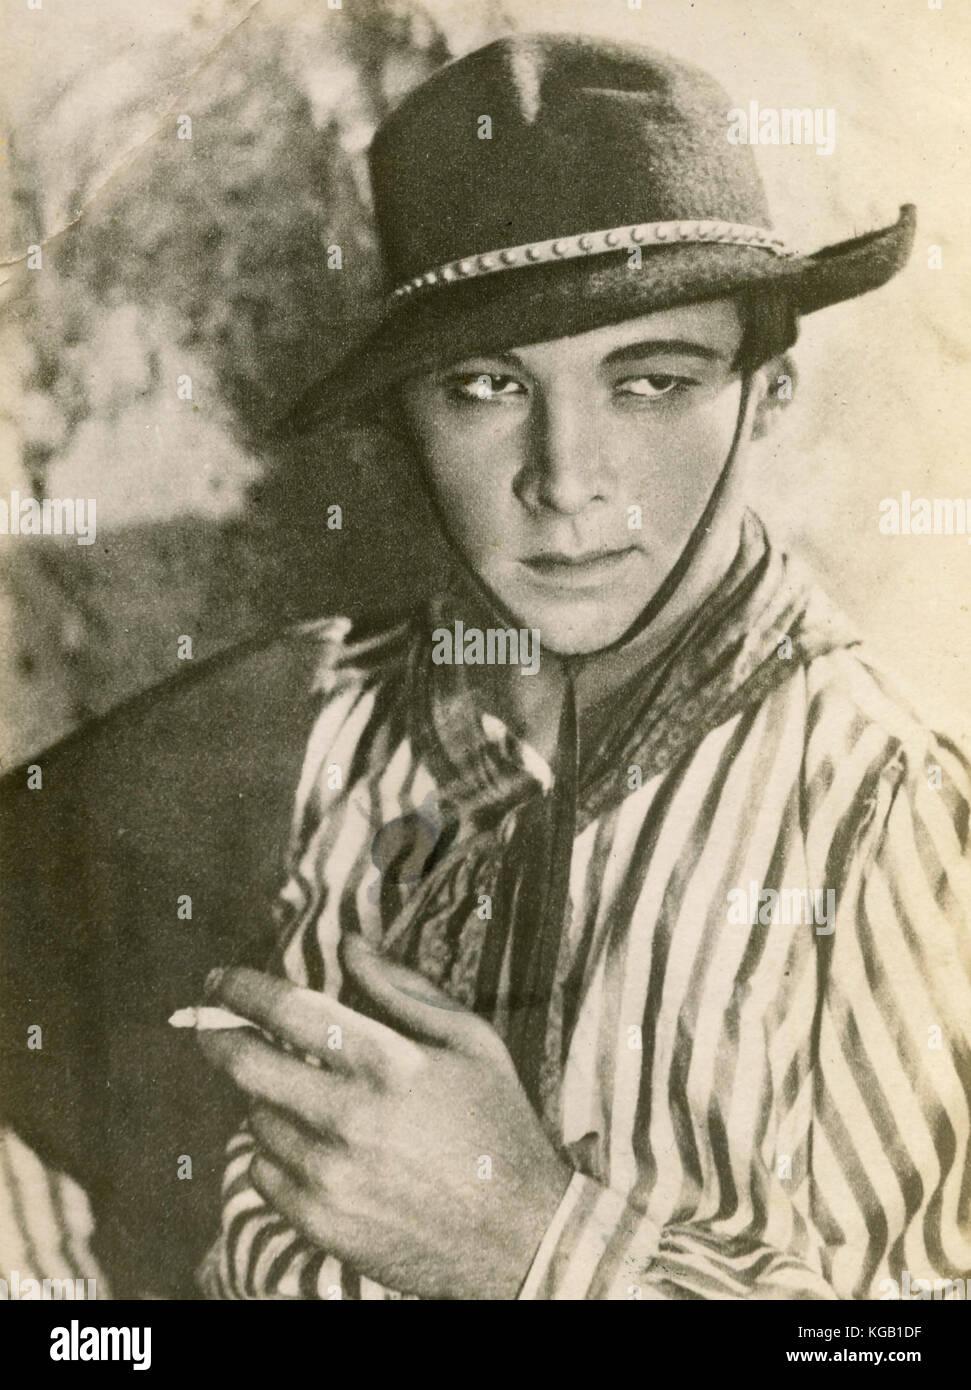 Italian-born American actor Rudolph Valentino as Julio in the movie The Four Horsemen of the Apocalypse, 1921 - Stock Image